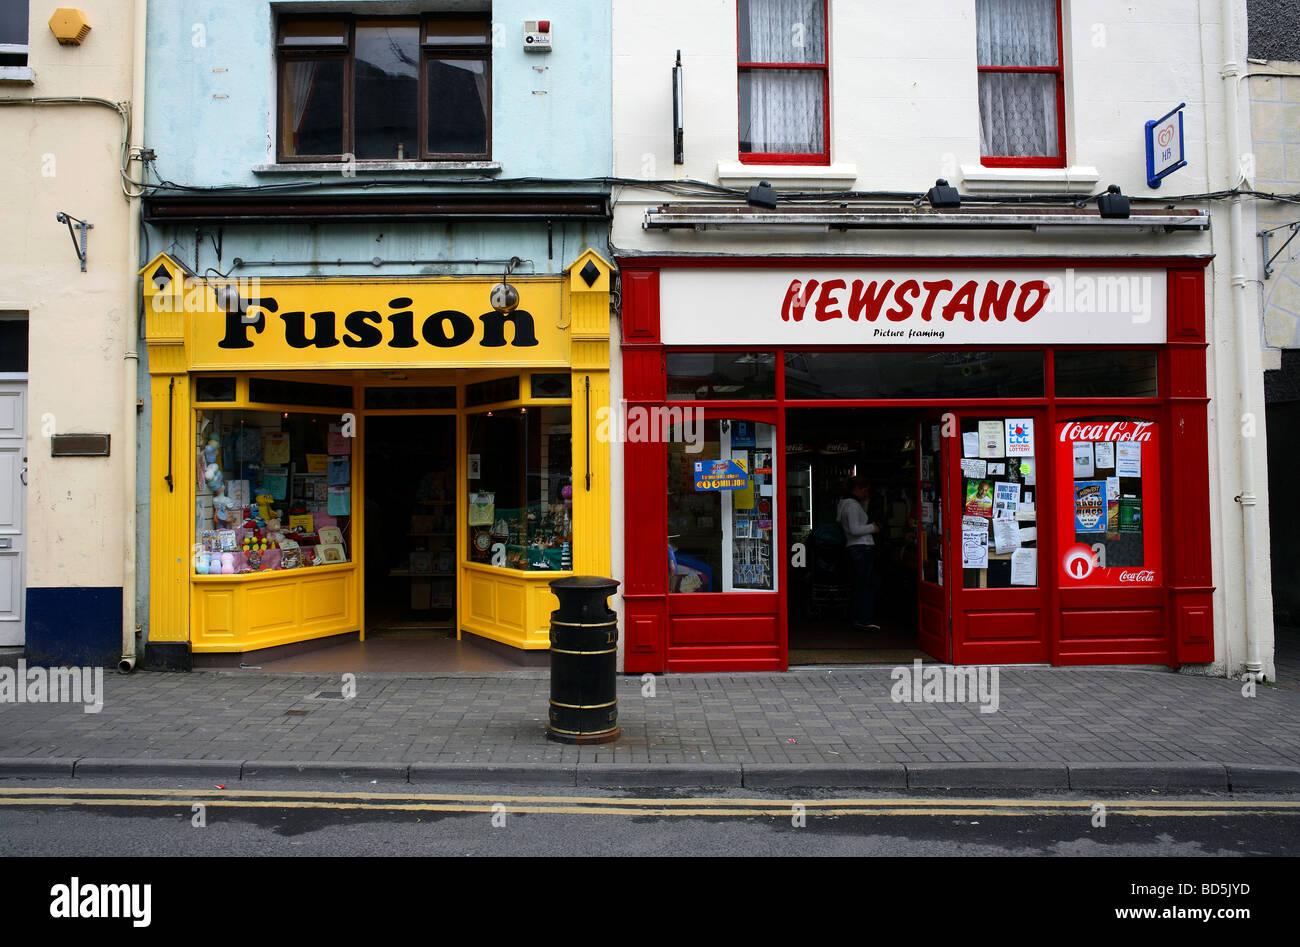 Street Shop Fronts in Ballin County Mayo Ireland - Stock Image